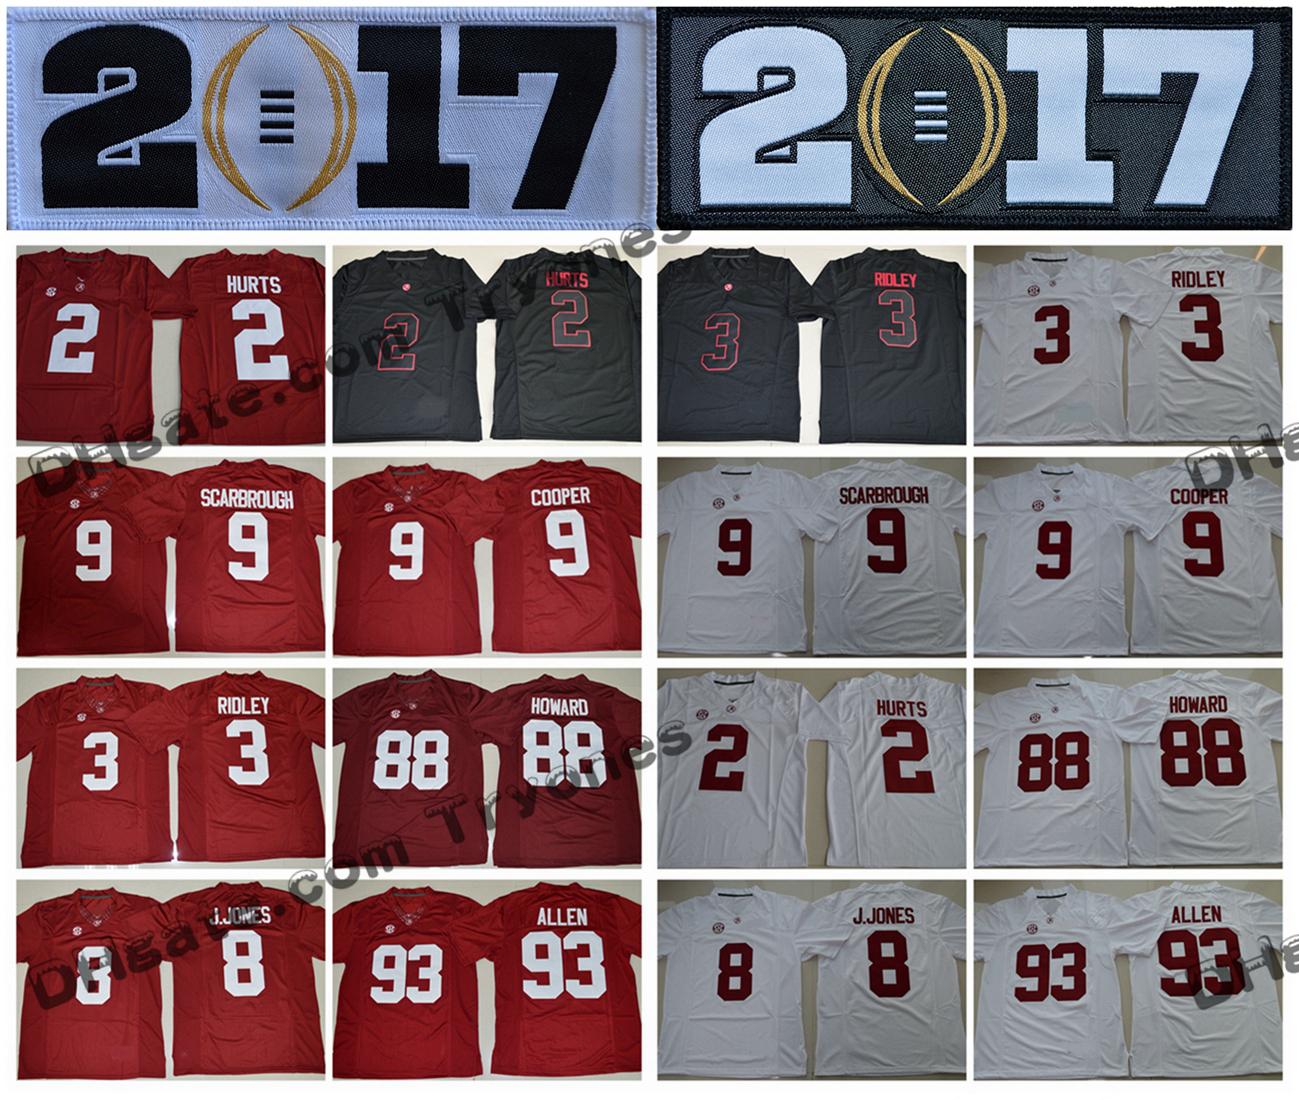 DHgate coupon: 2017 Alabama Crimson Tide 2 Jalen Hurts 3 Ridley Julio Jones Jonathan Allen Amari Cooper 9 Bo Scarbrough OJ Howard College Football Jersey